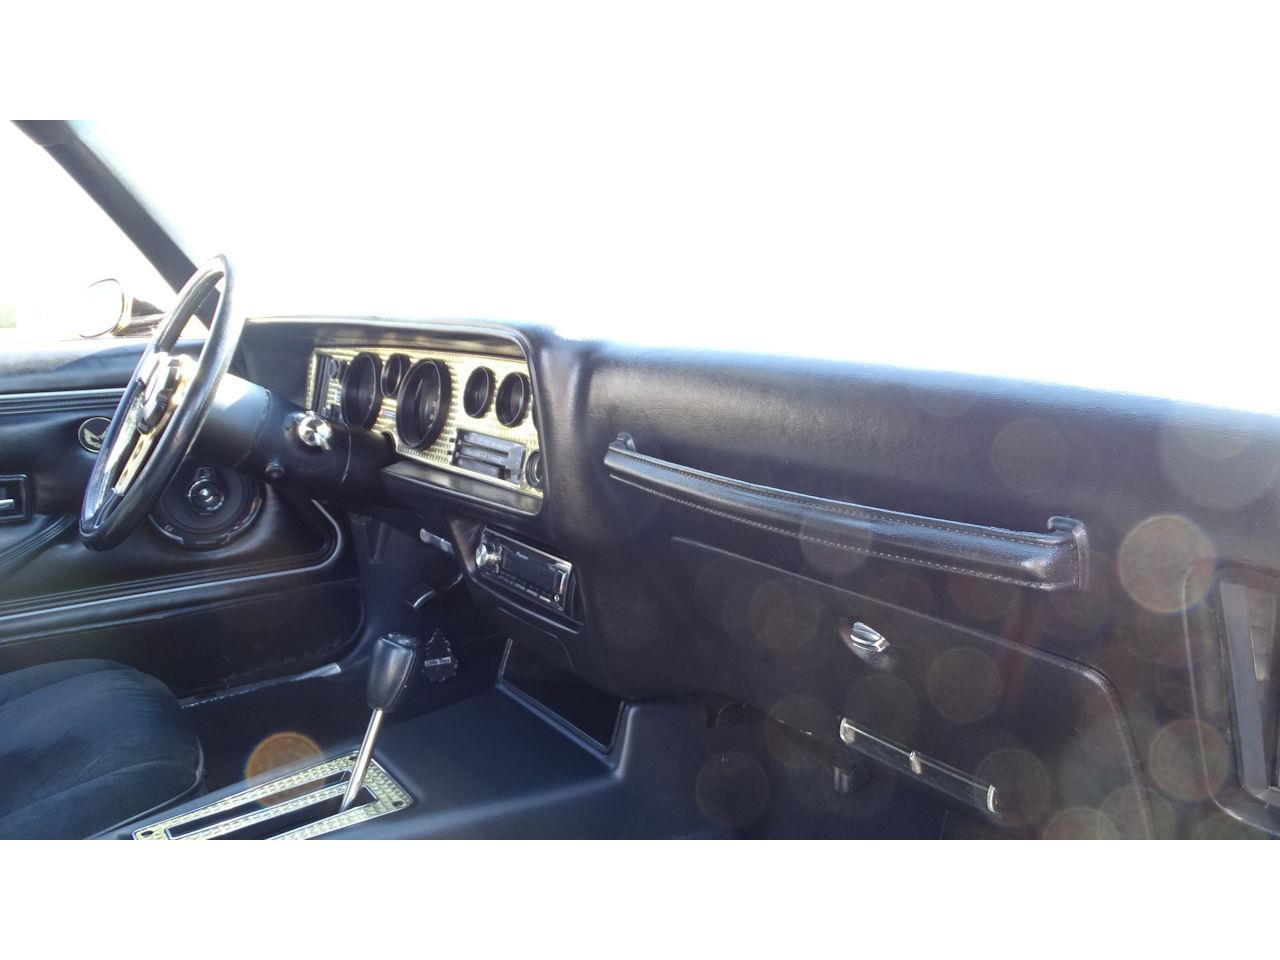 1978 Pontiac Firebird Trans Am (CC-1419150) for sale in O'Fallon, Illinois